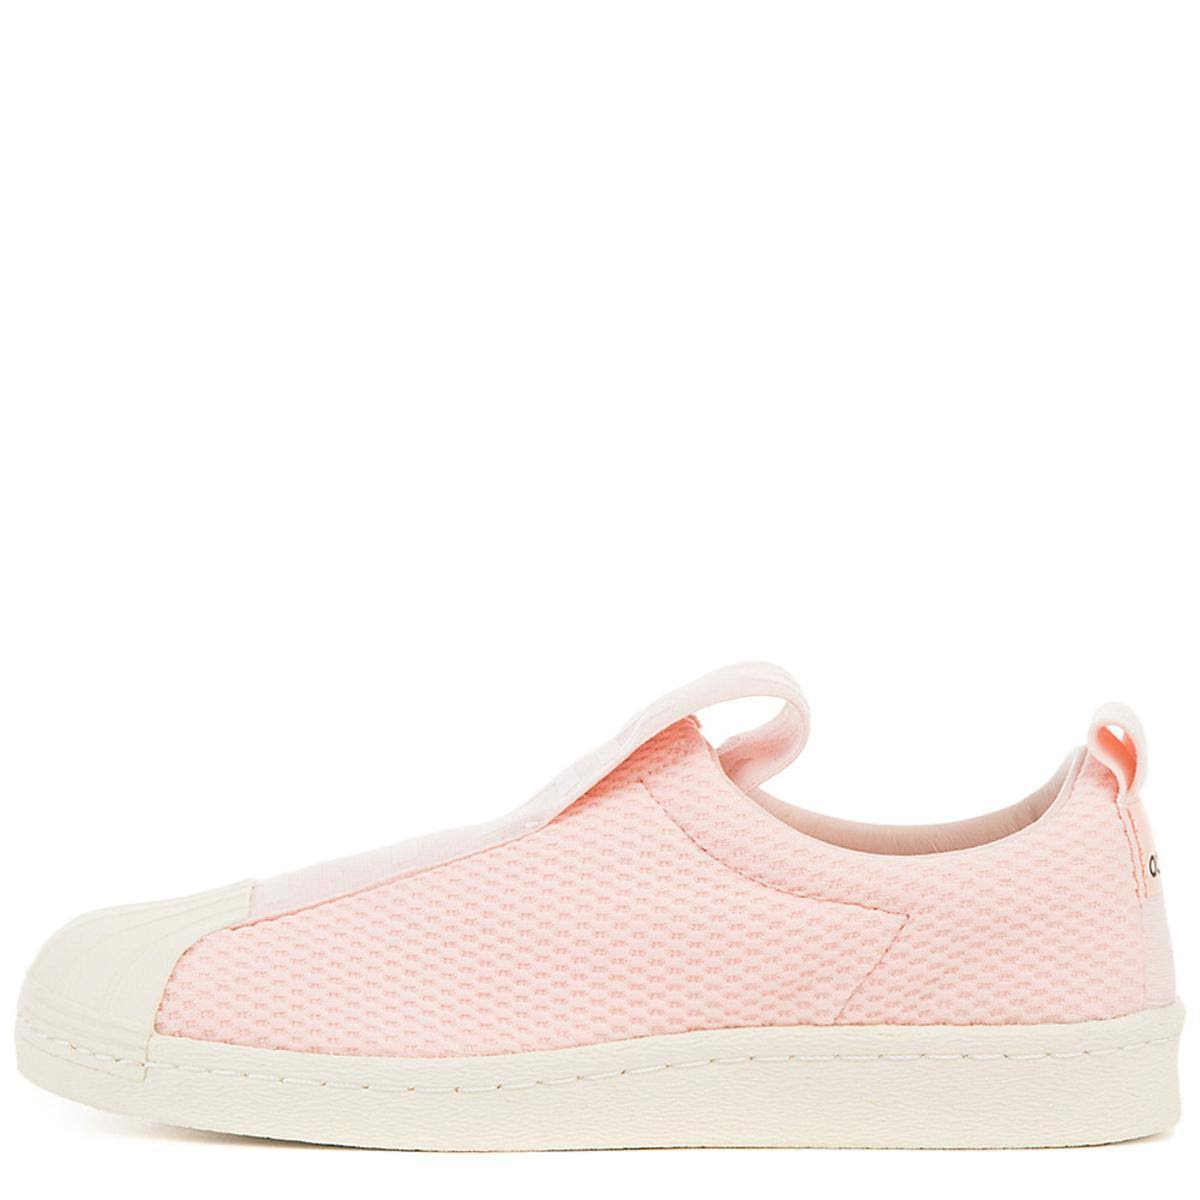 5 Sneaker Bw35 Slipon Women's Superstar Adidas OwqfA8W